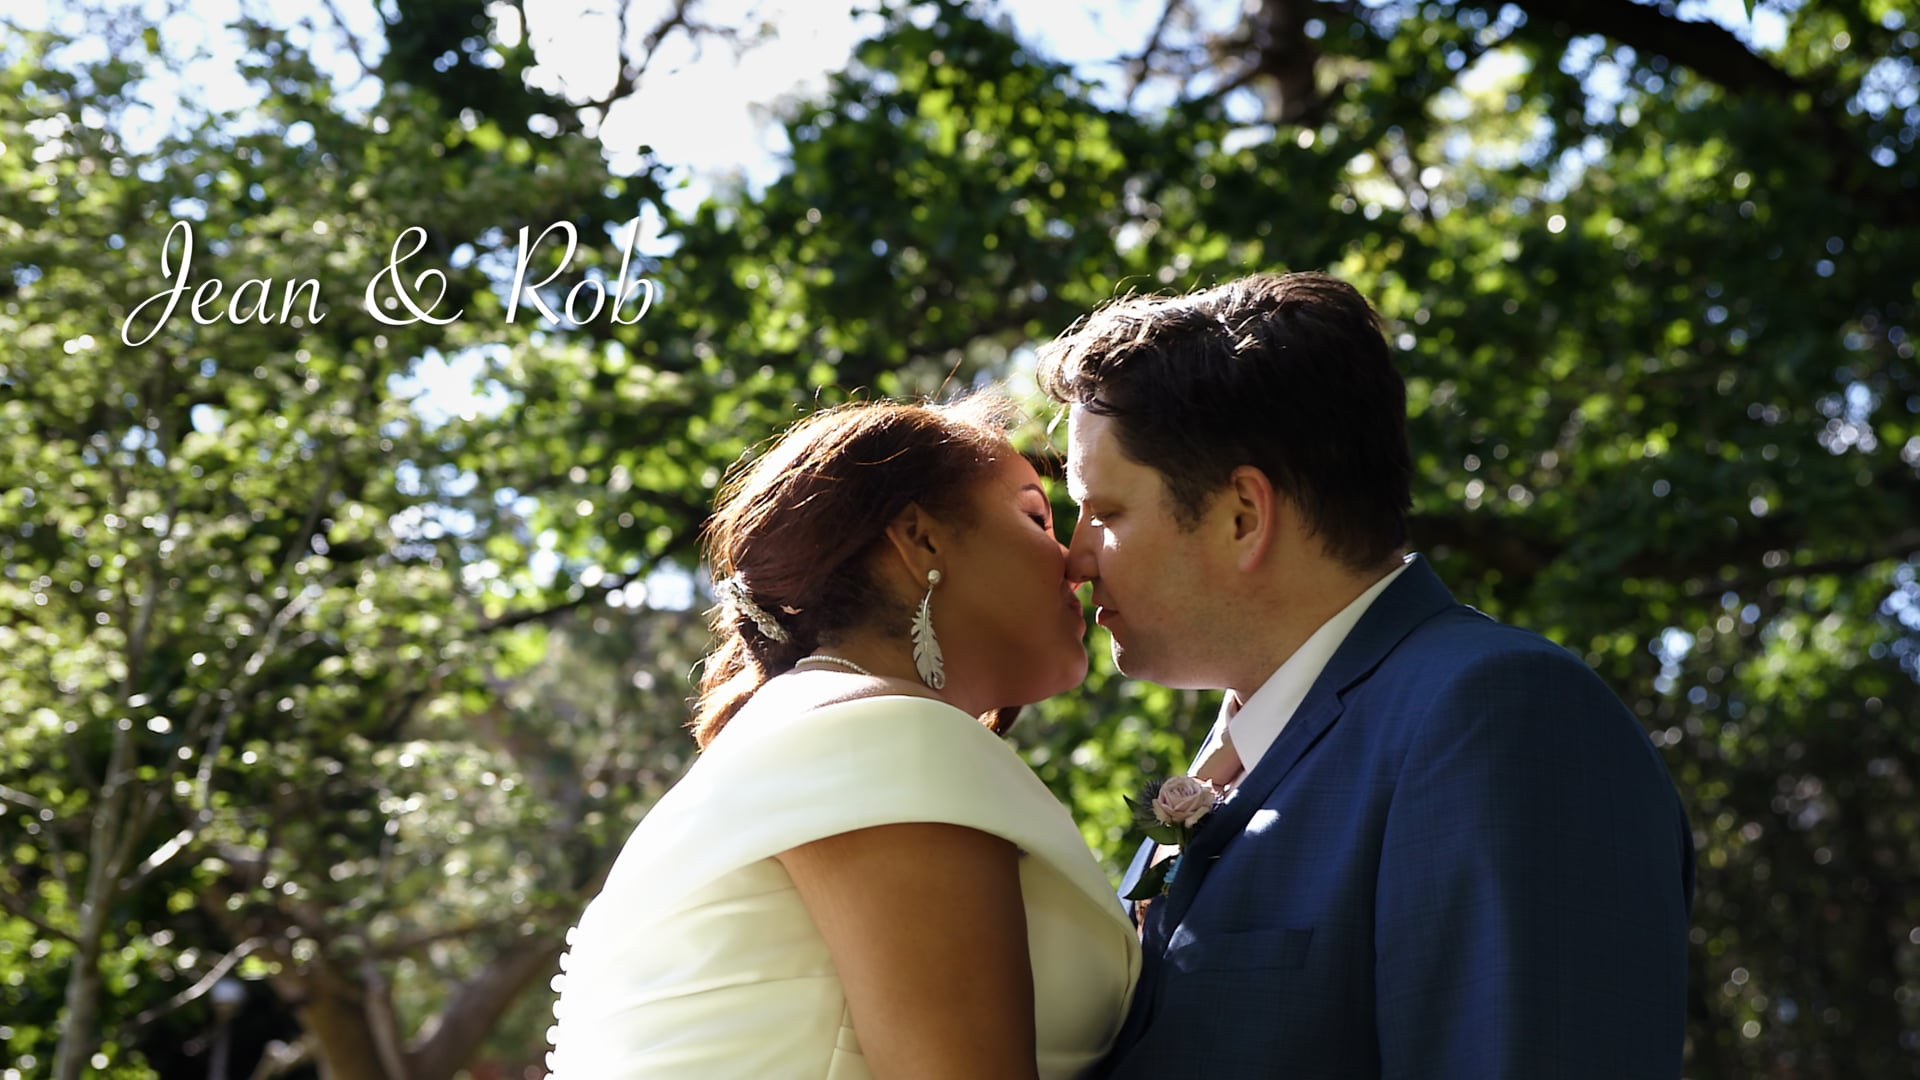 Jean & Rob - Wedding Highlights (Event)